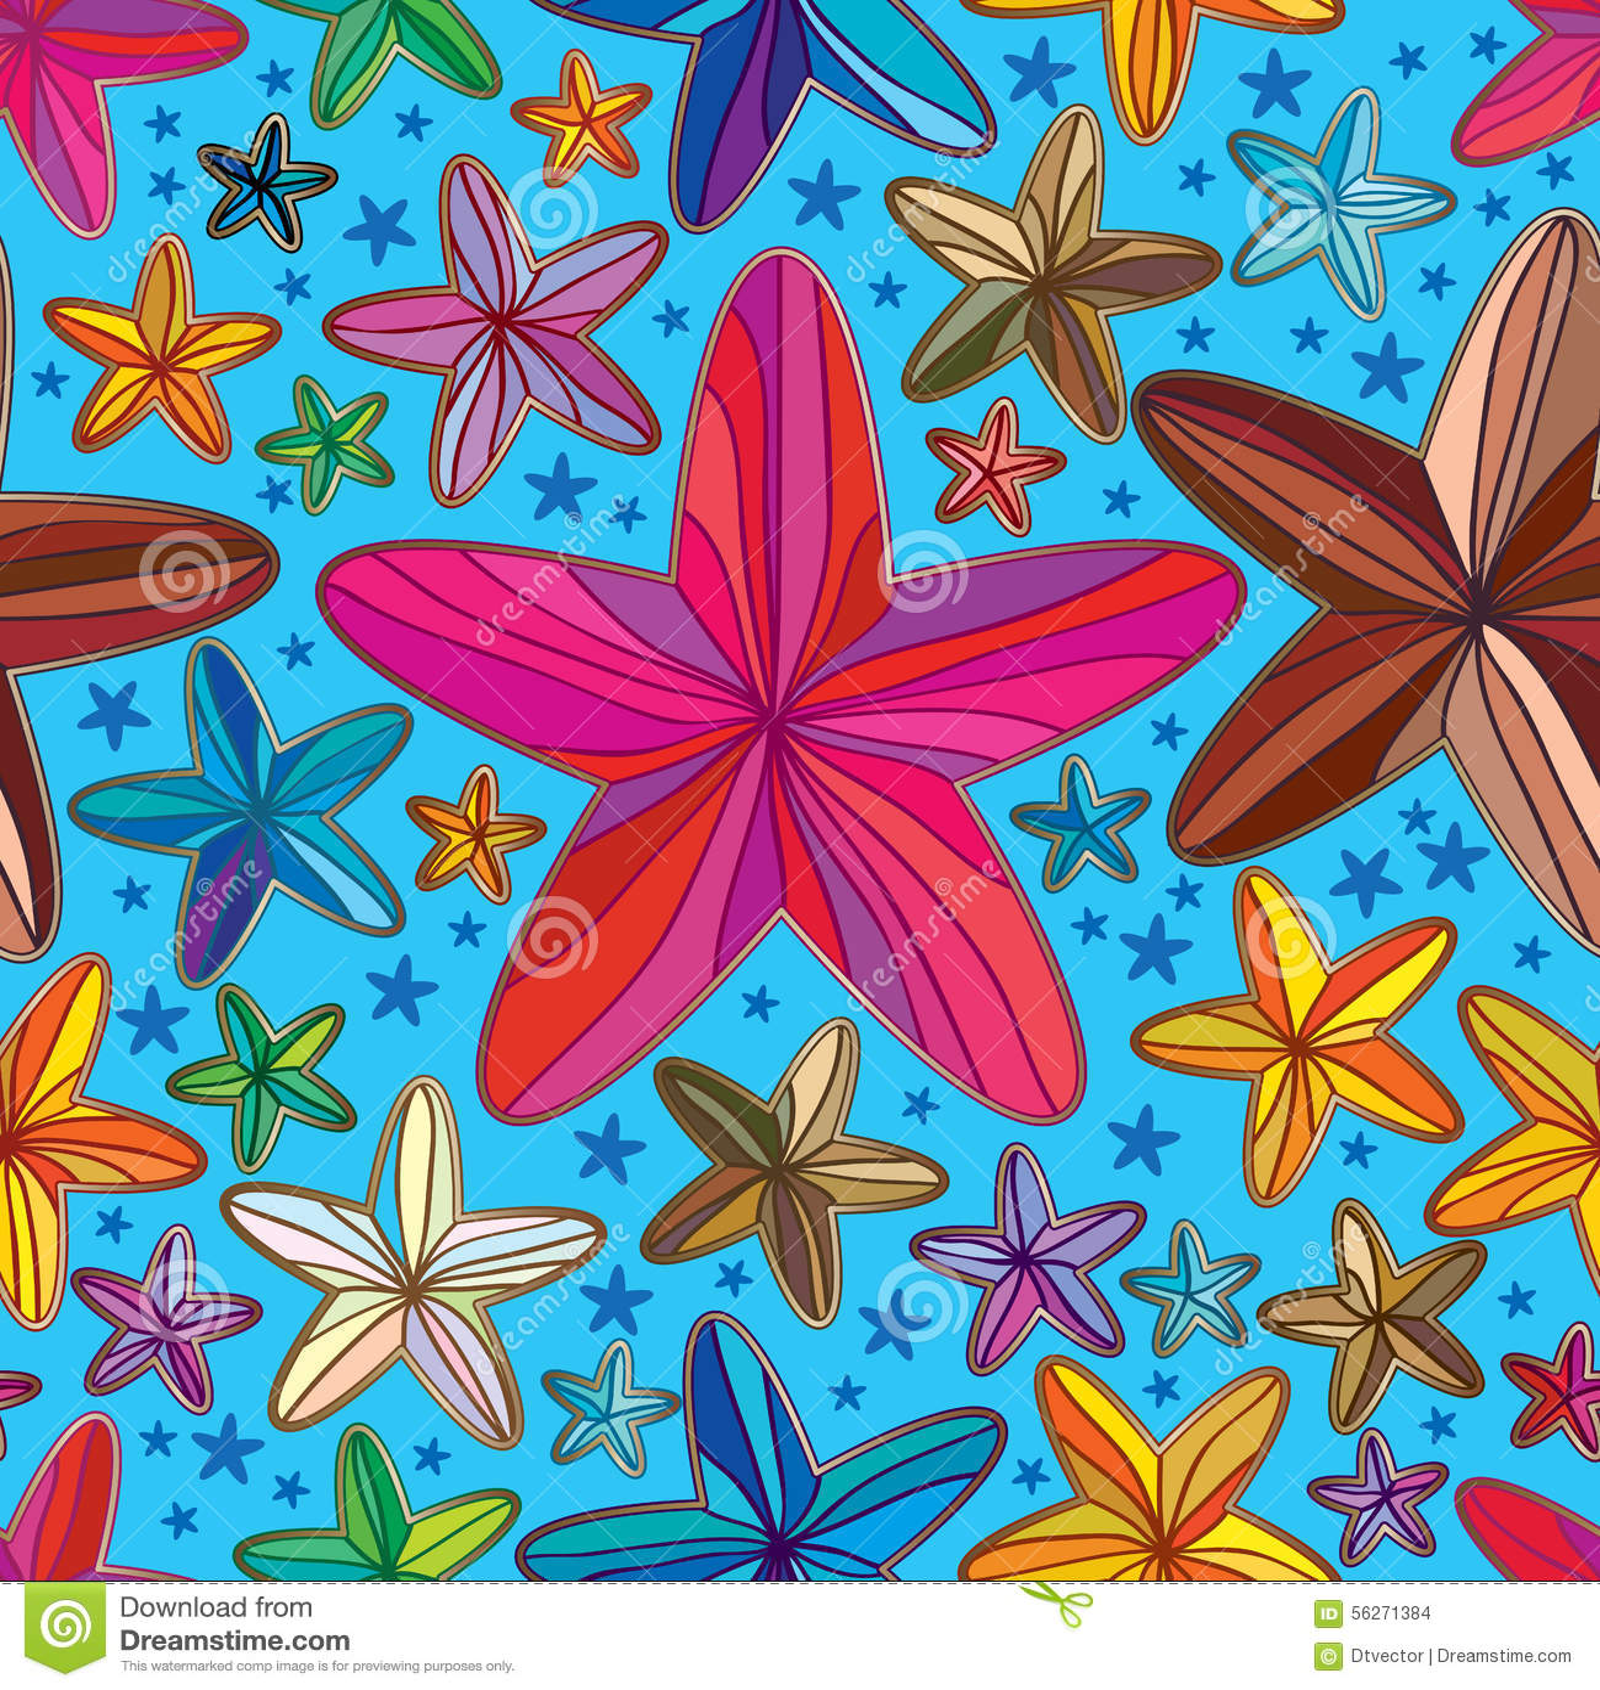 Line Art Flowers Husqvarna : Flower star shape line draw seamless pattern stock vector